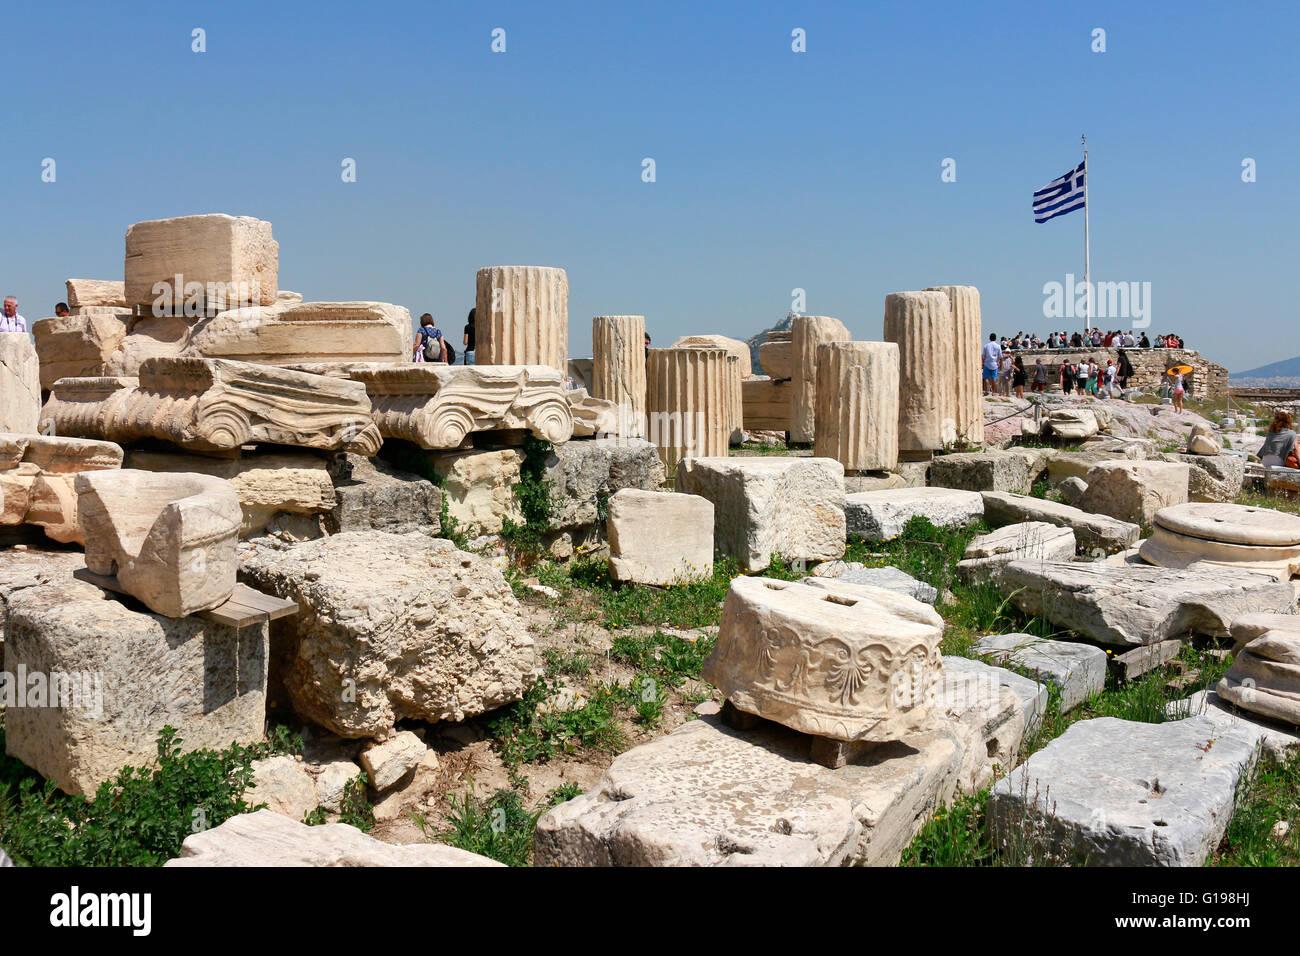 griechische Fahne, Akropolis, Athen, Griechenland. - Stock Image